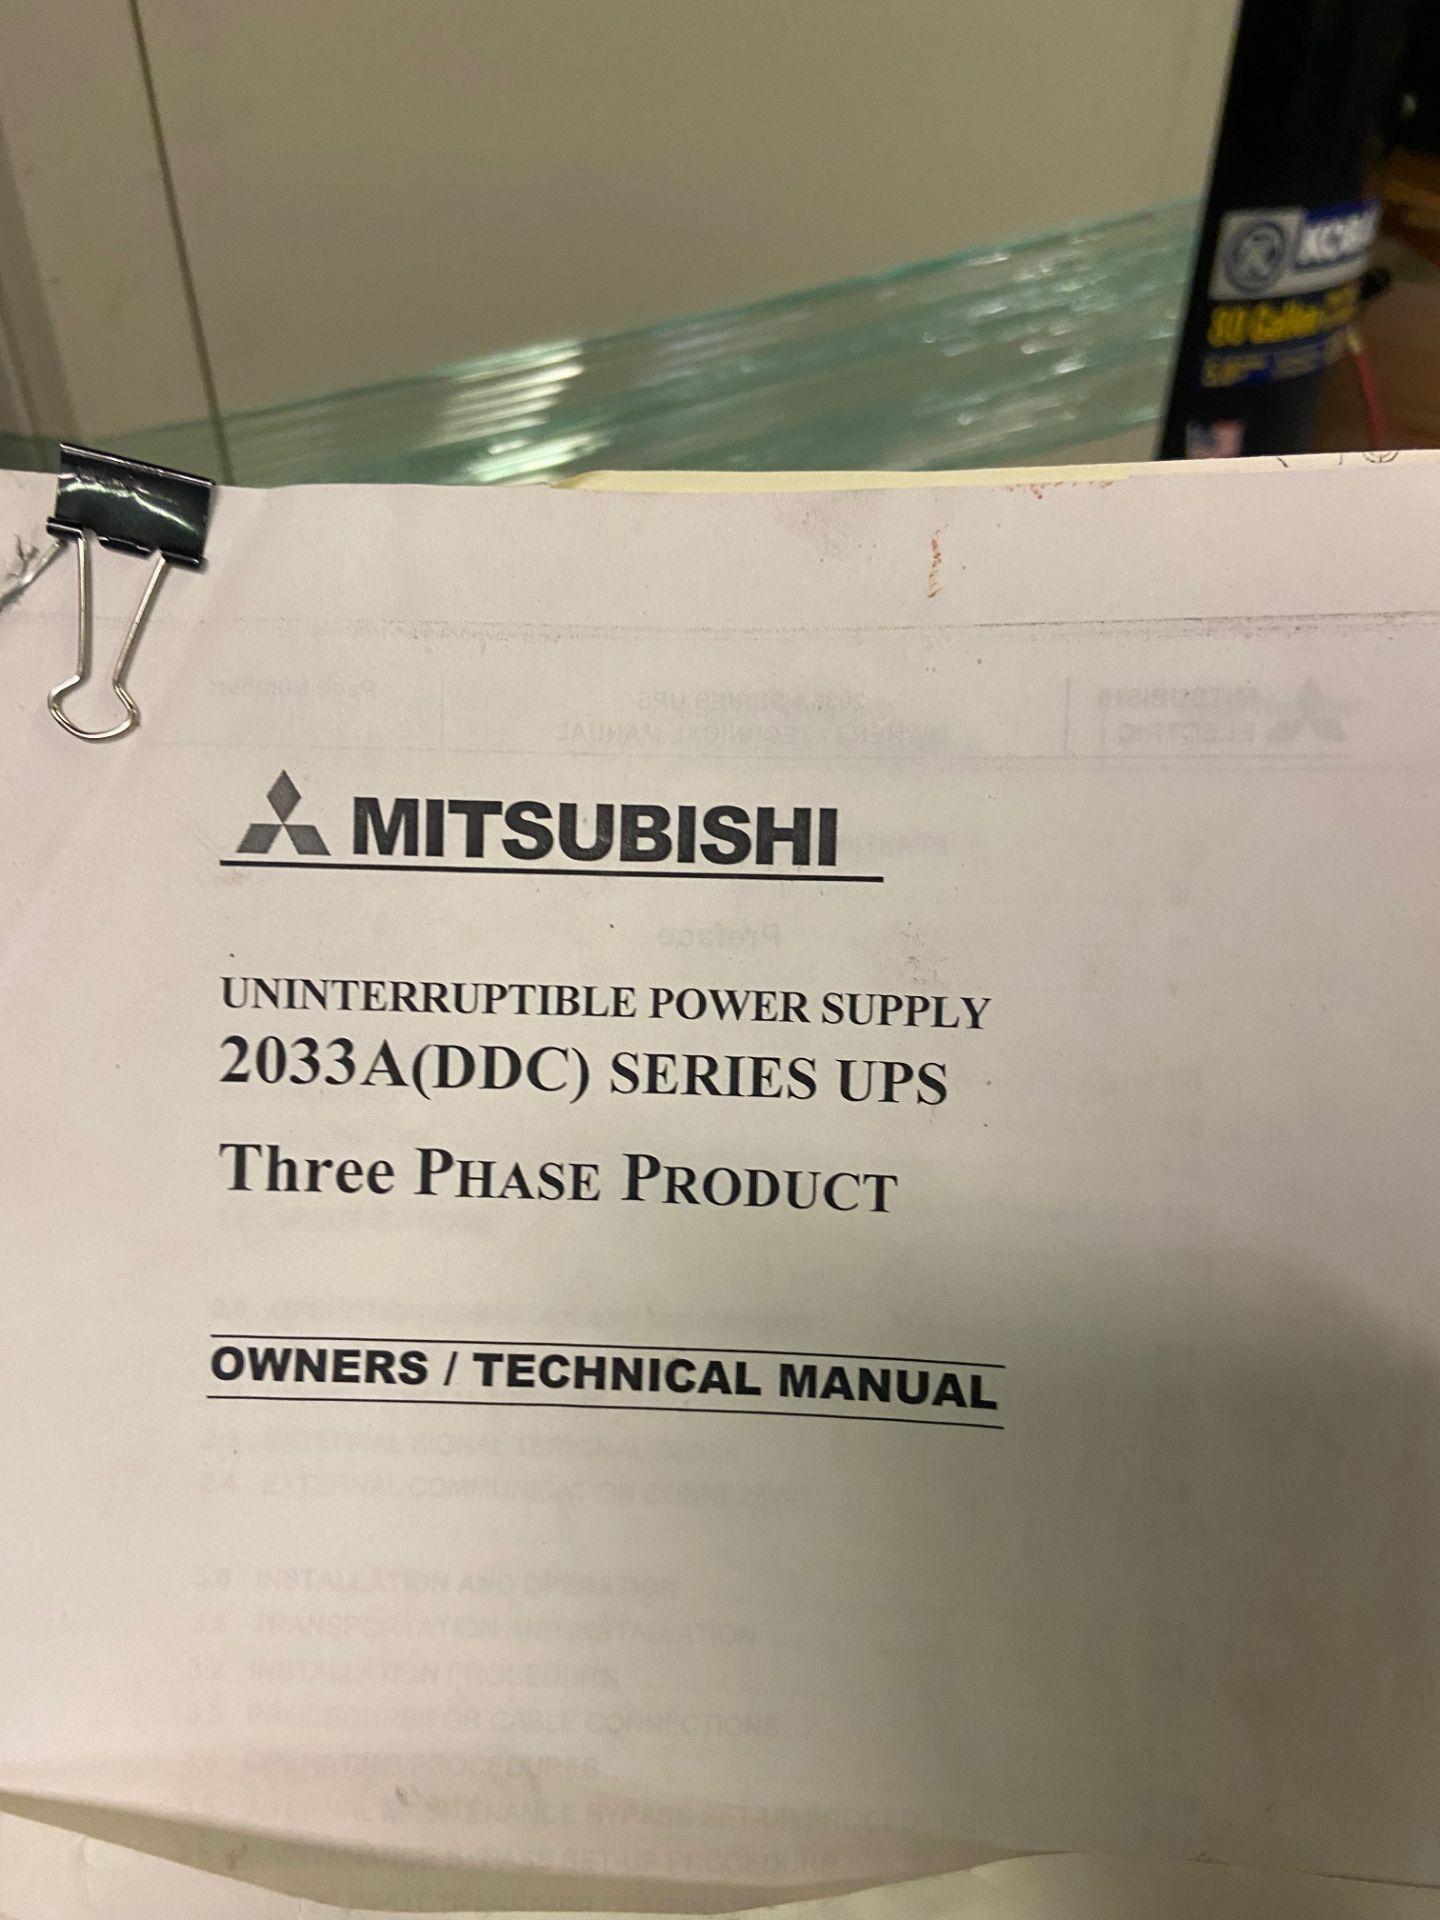 Mitsubishi Uninterruptible Power Supply, 2033A Series, Type UP2033A-B403SU-2, Serial# 96-GC8YQI-04, - Image 5 of 6